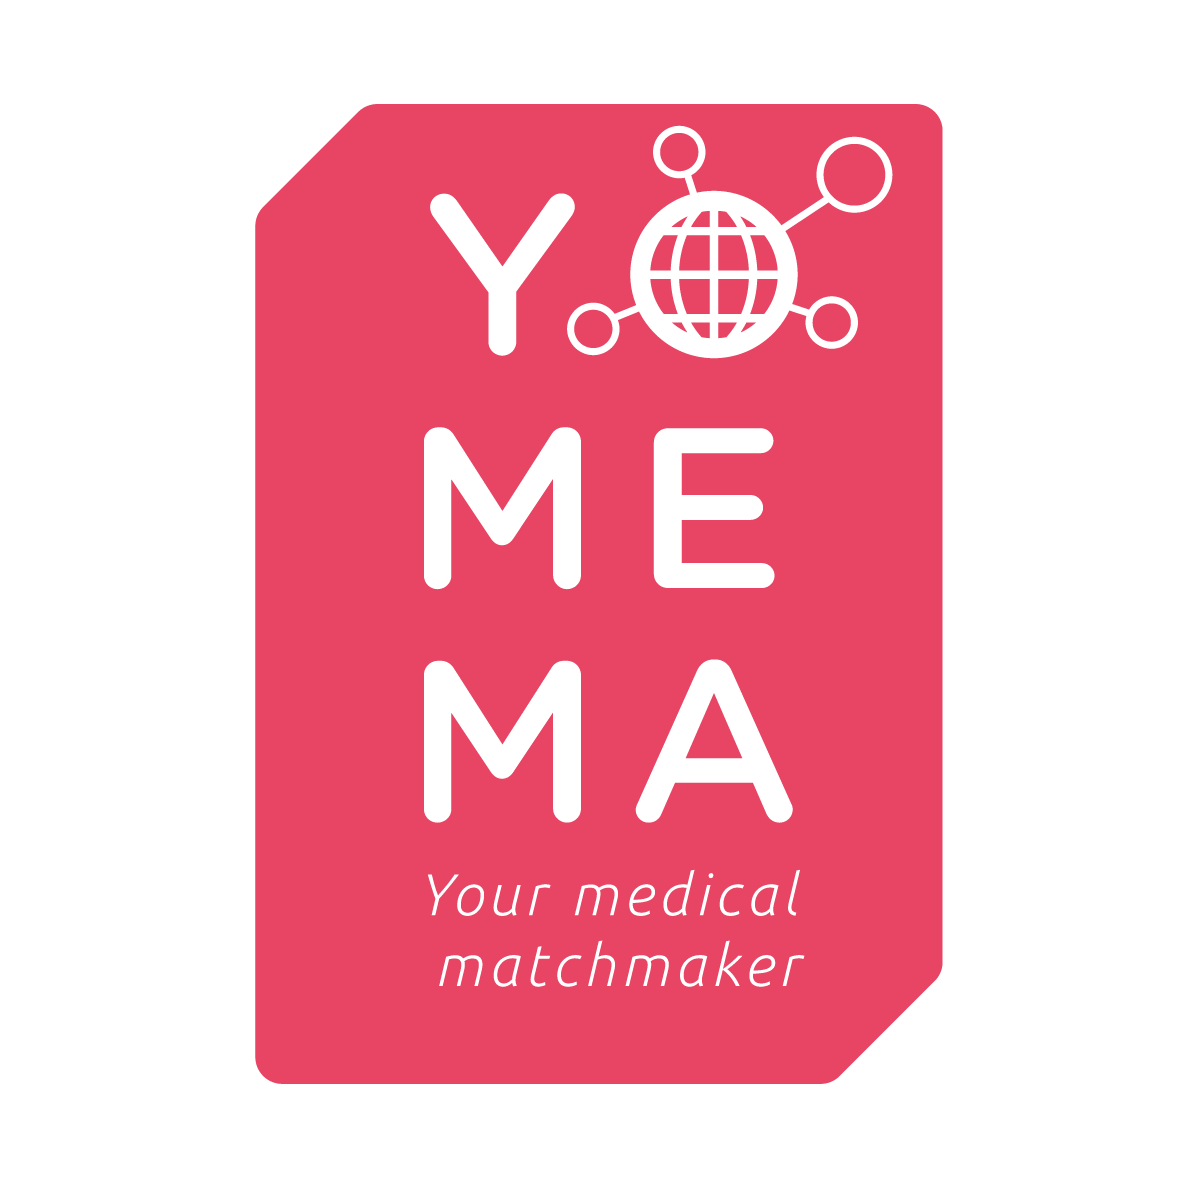 YOMEMA